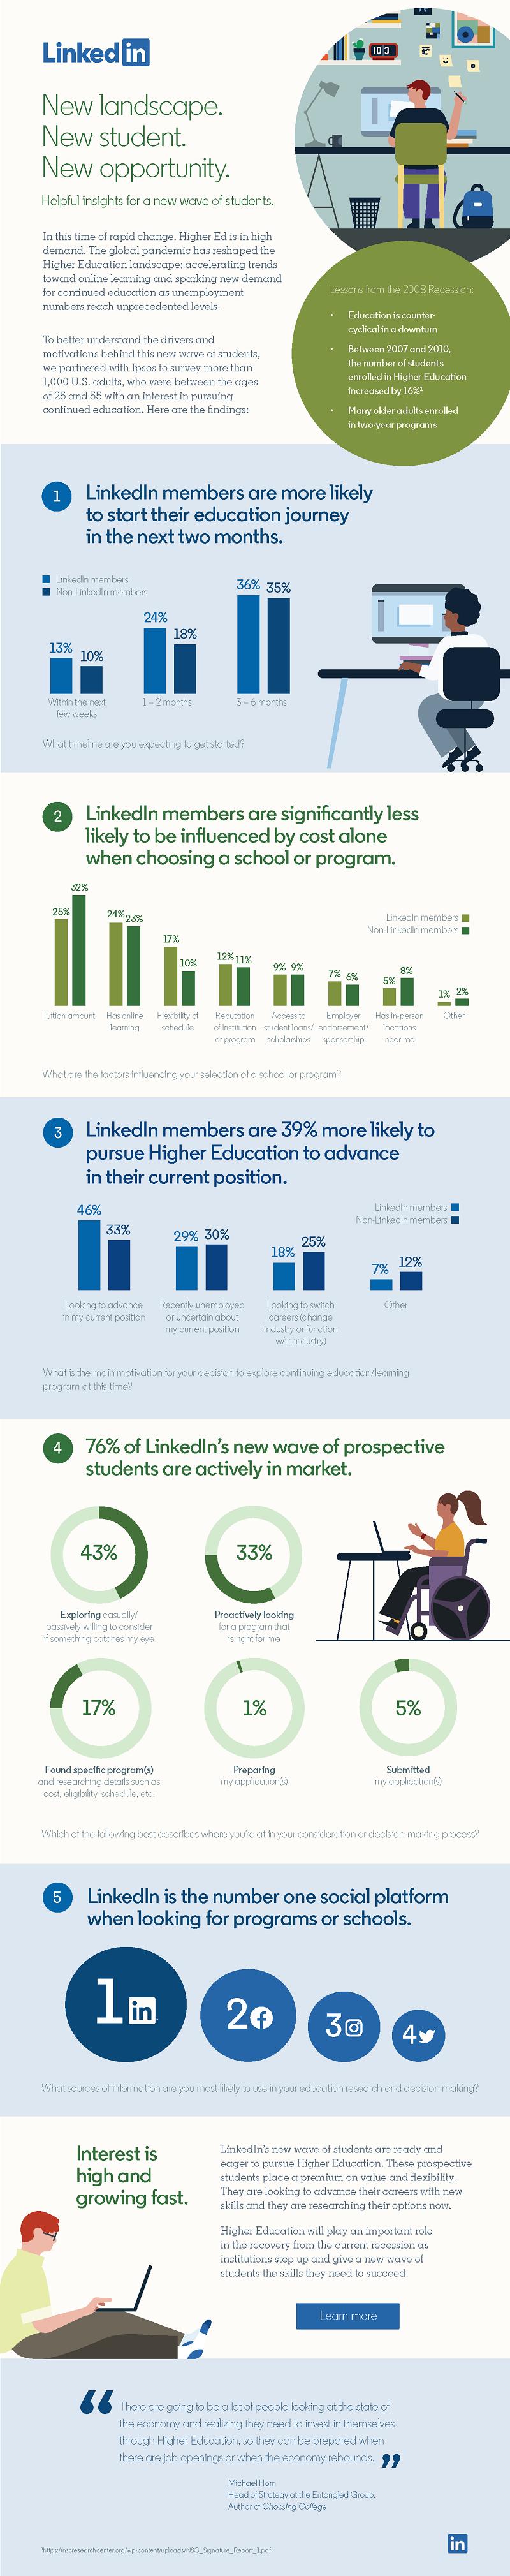 LinkedIn higher education survey